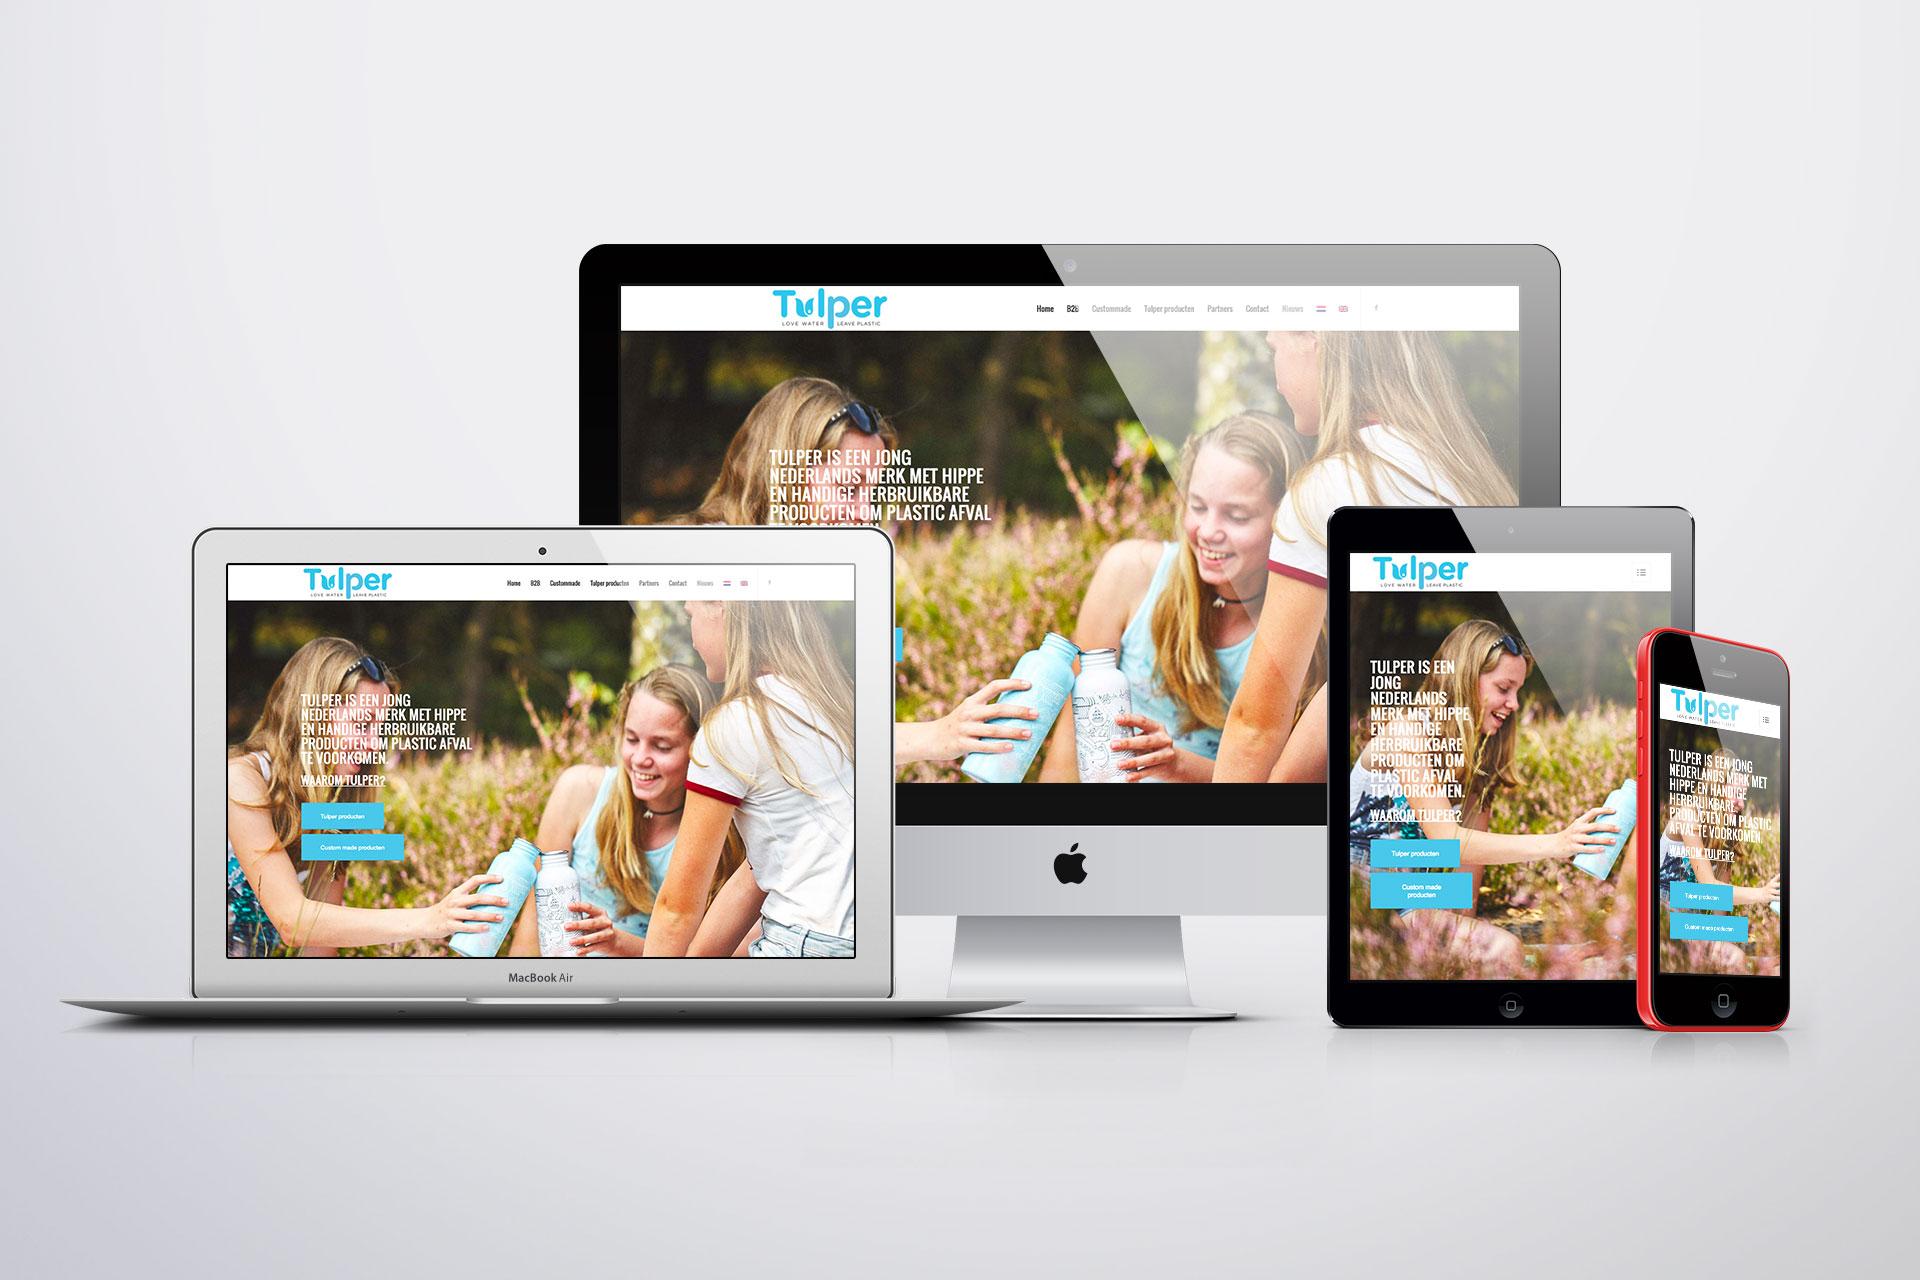 Tulper Portfolio Website Mockup